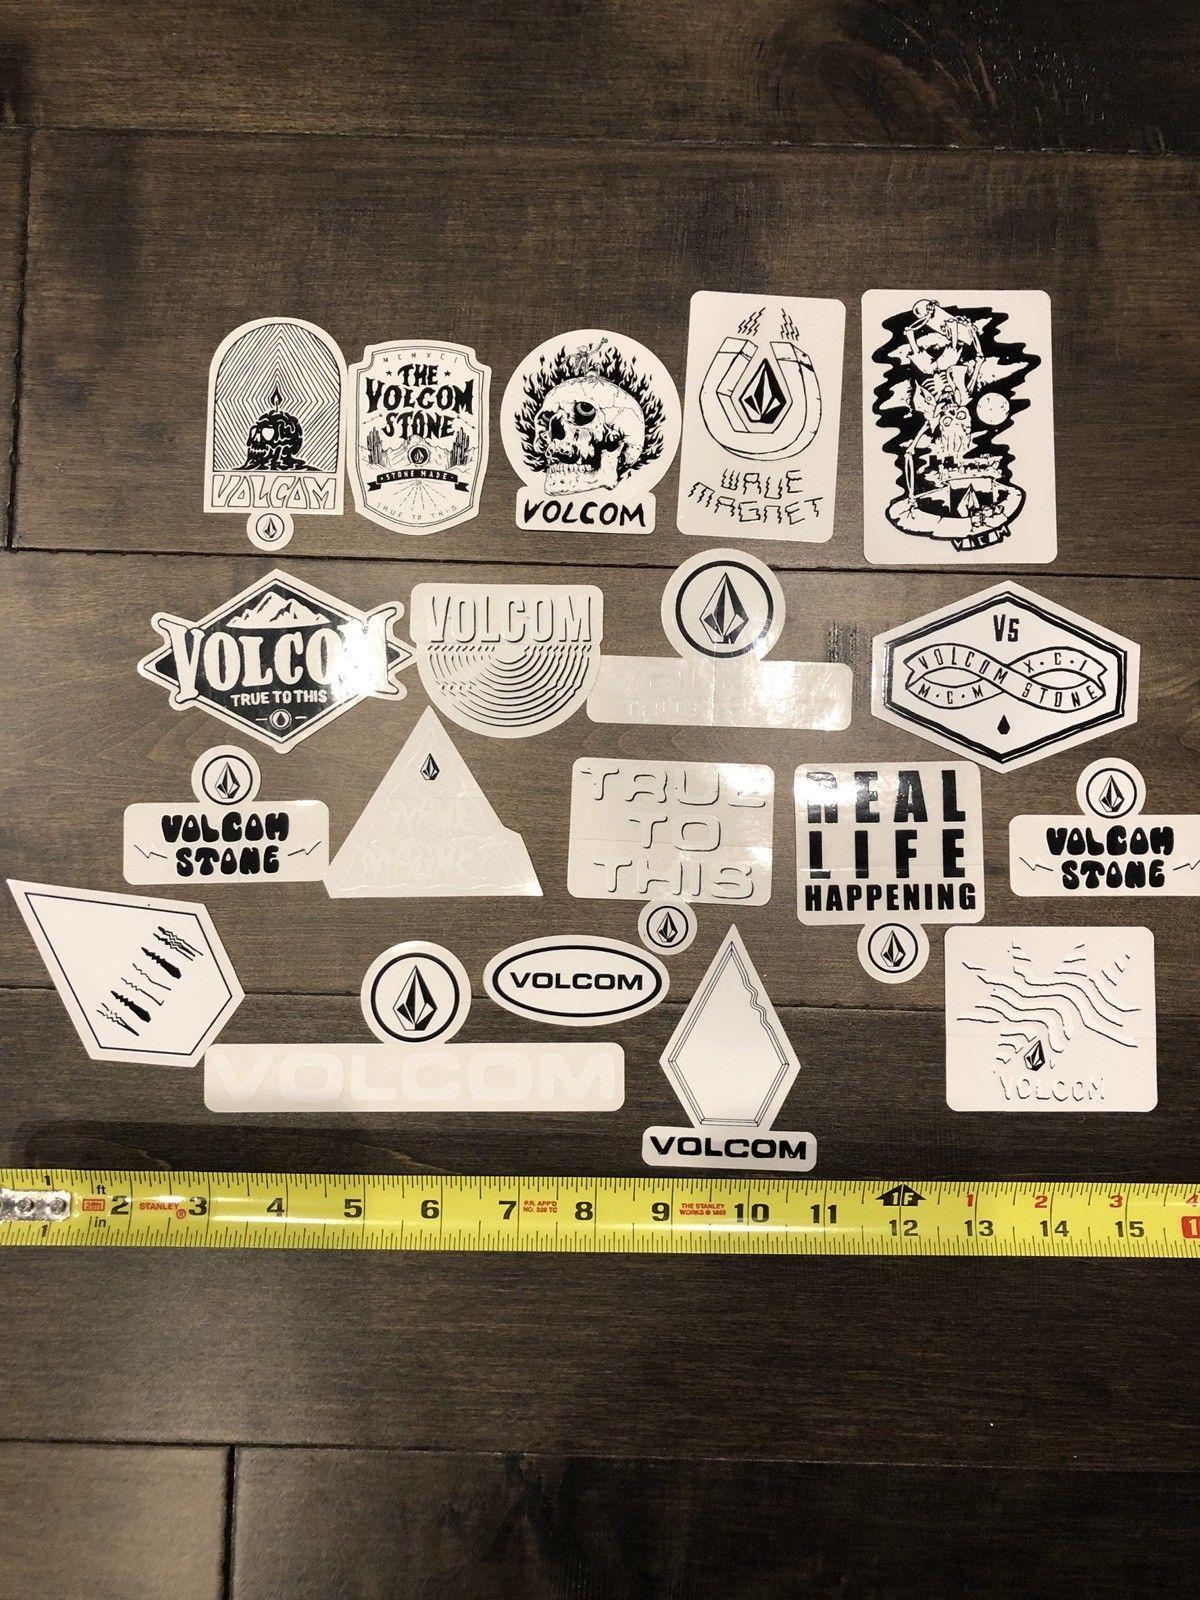 11 Volcom Stickers Skateboarding Decal Stickers Skateboarding Clothing Skate